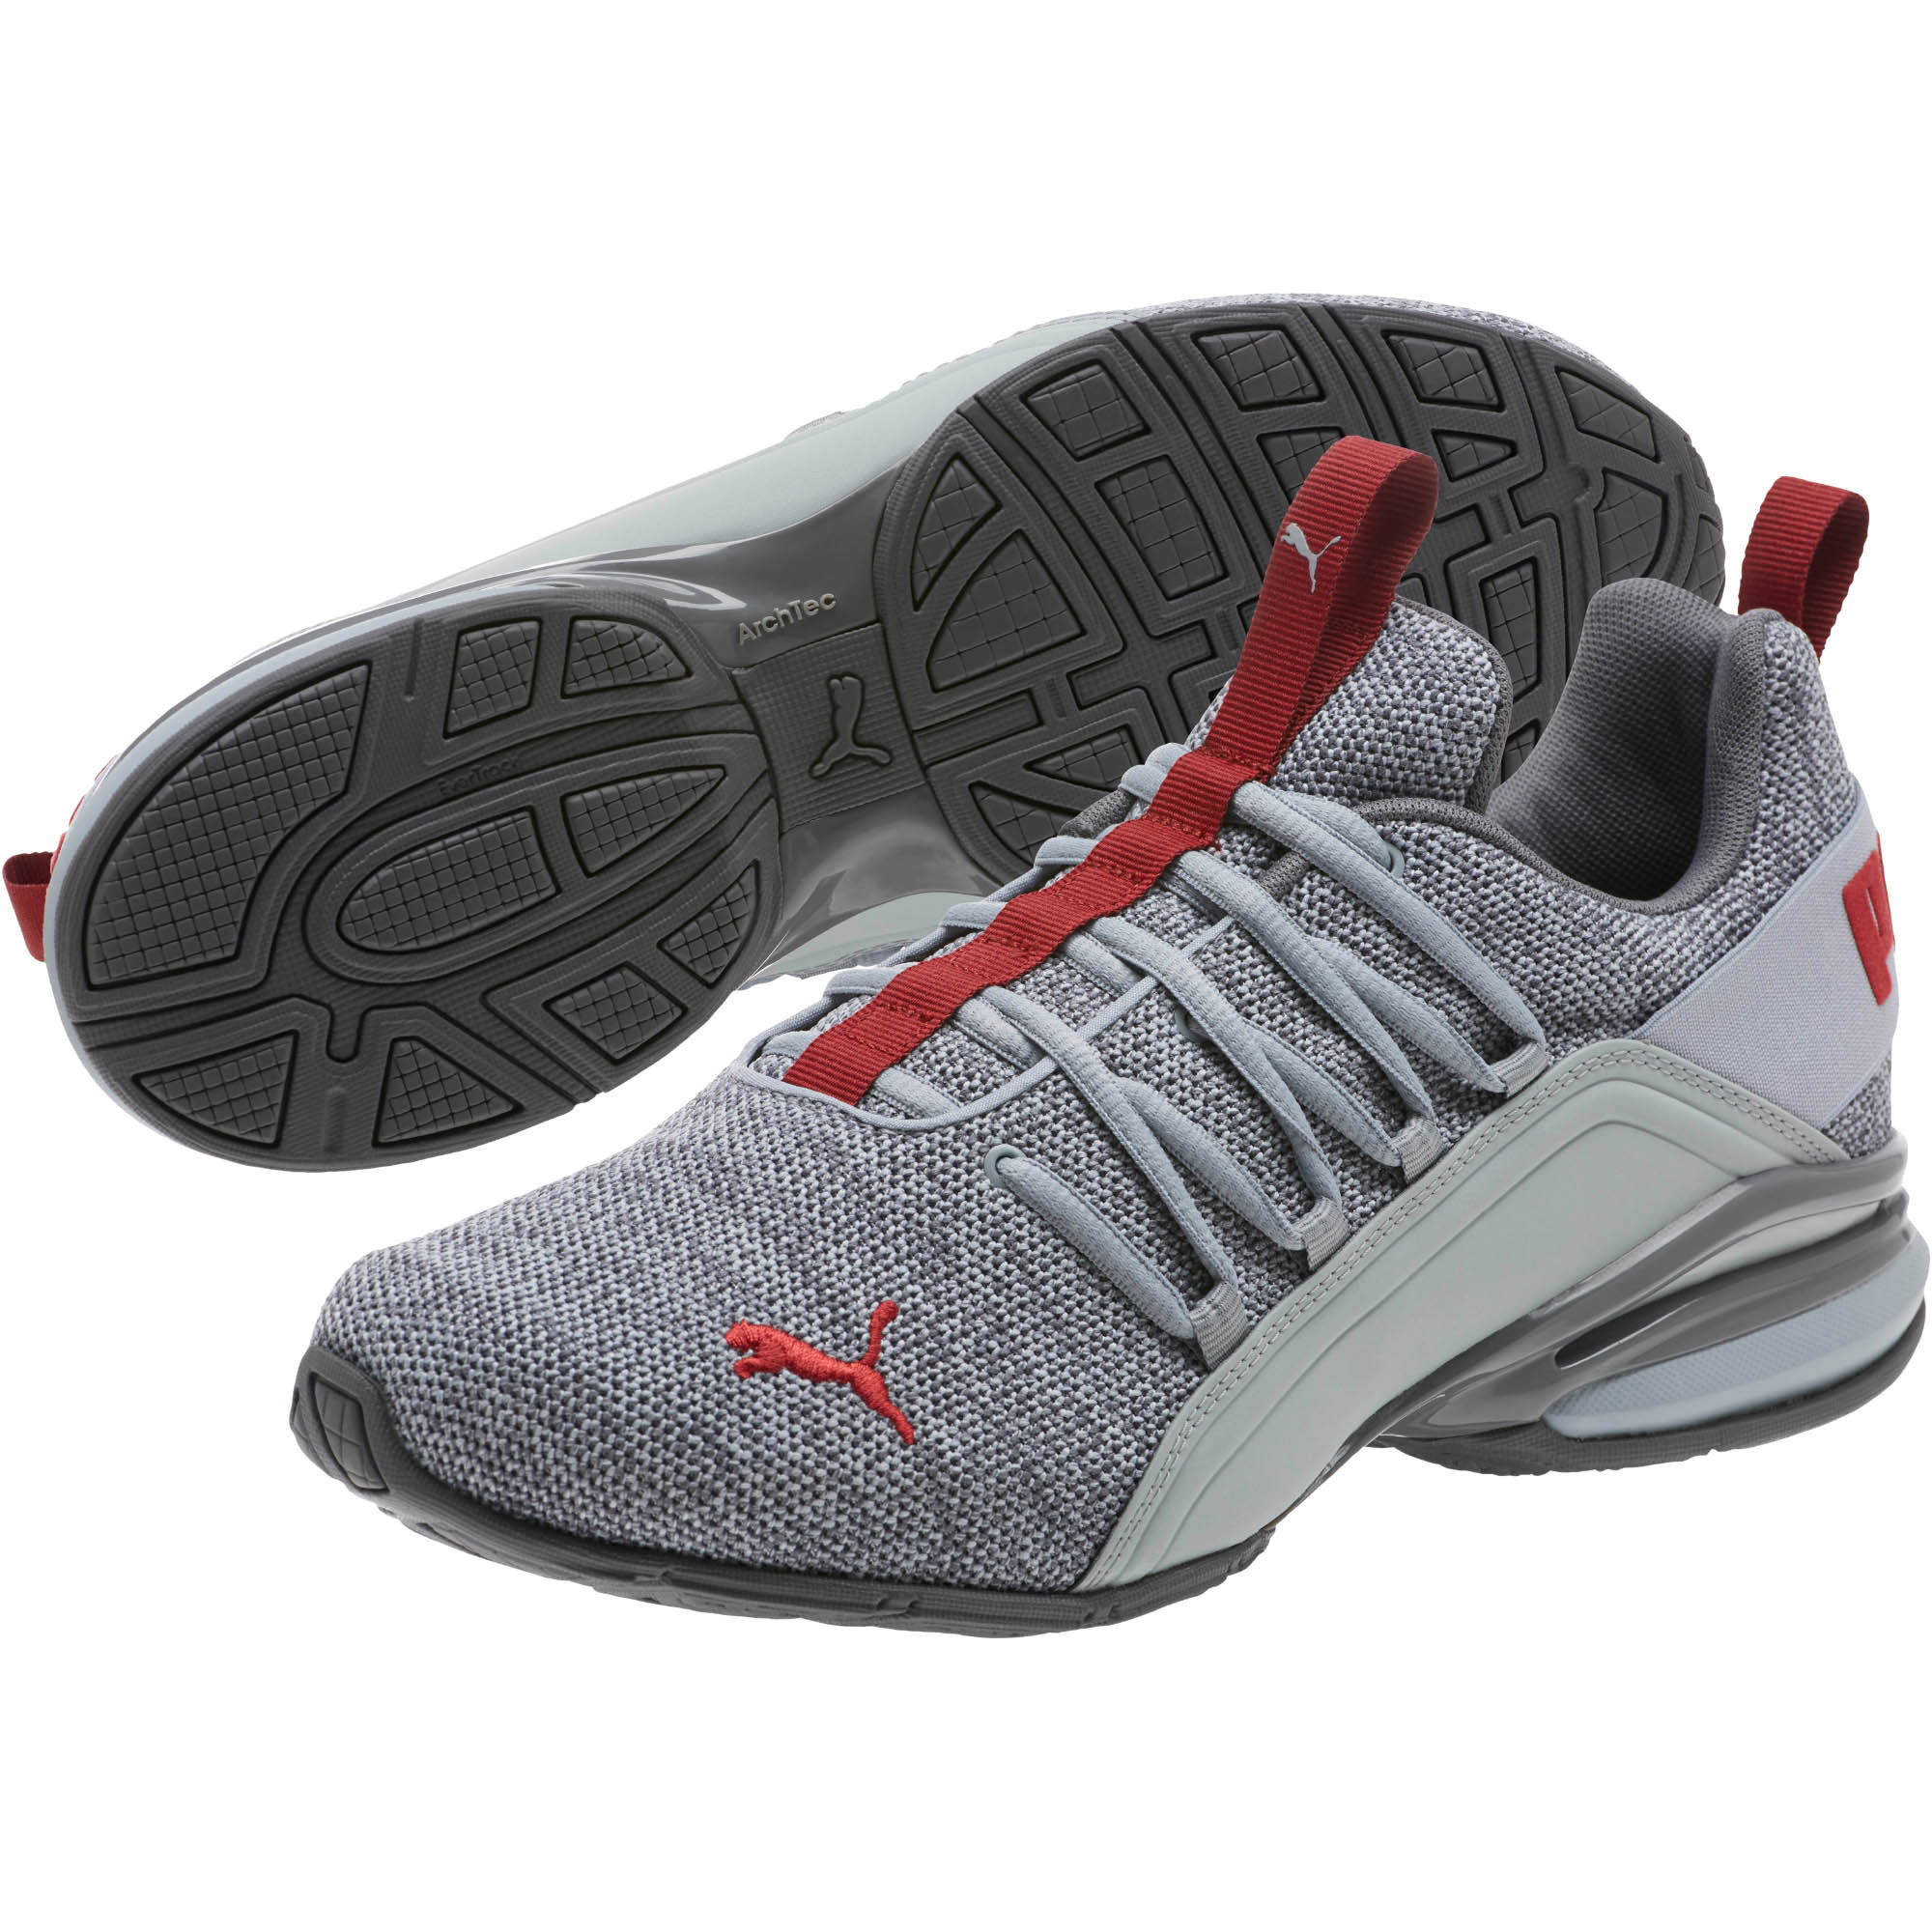 PUMA-Axelion-Men-039-s-Training-Shoes-Men-Shoe-Running thumbnail 6